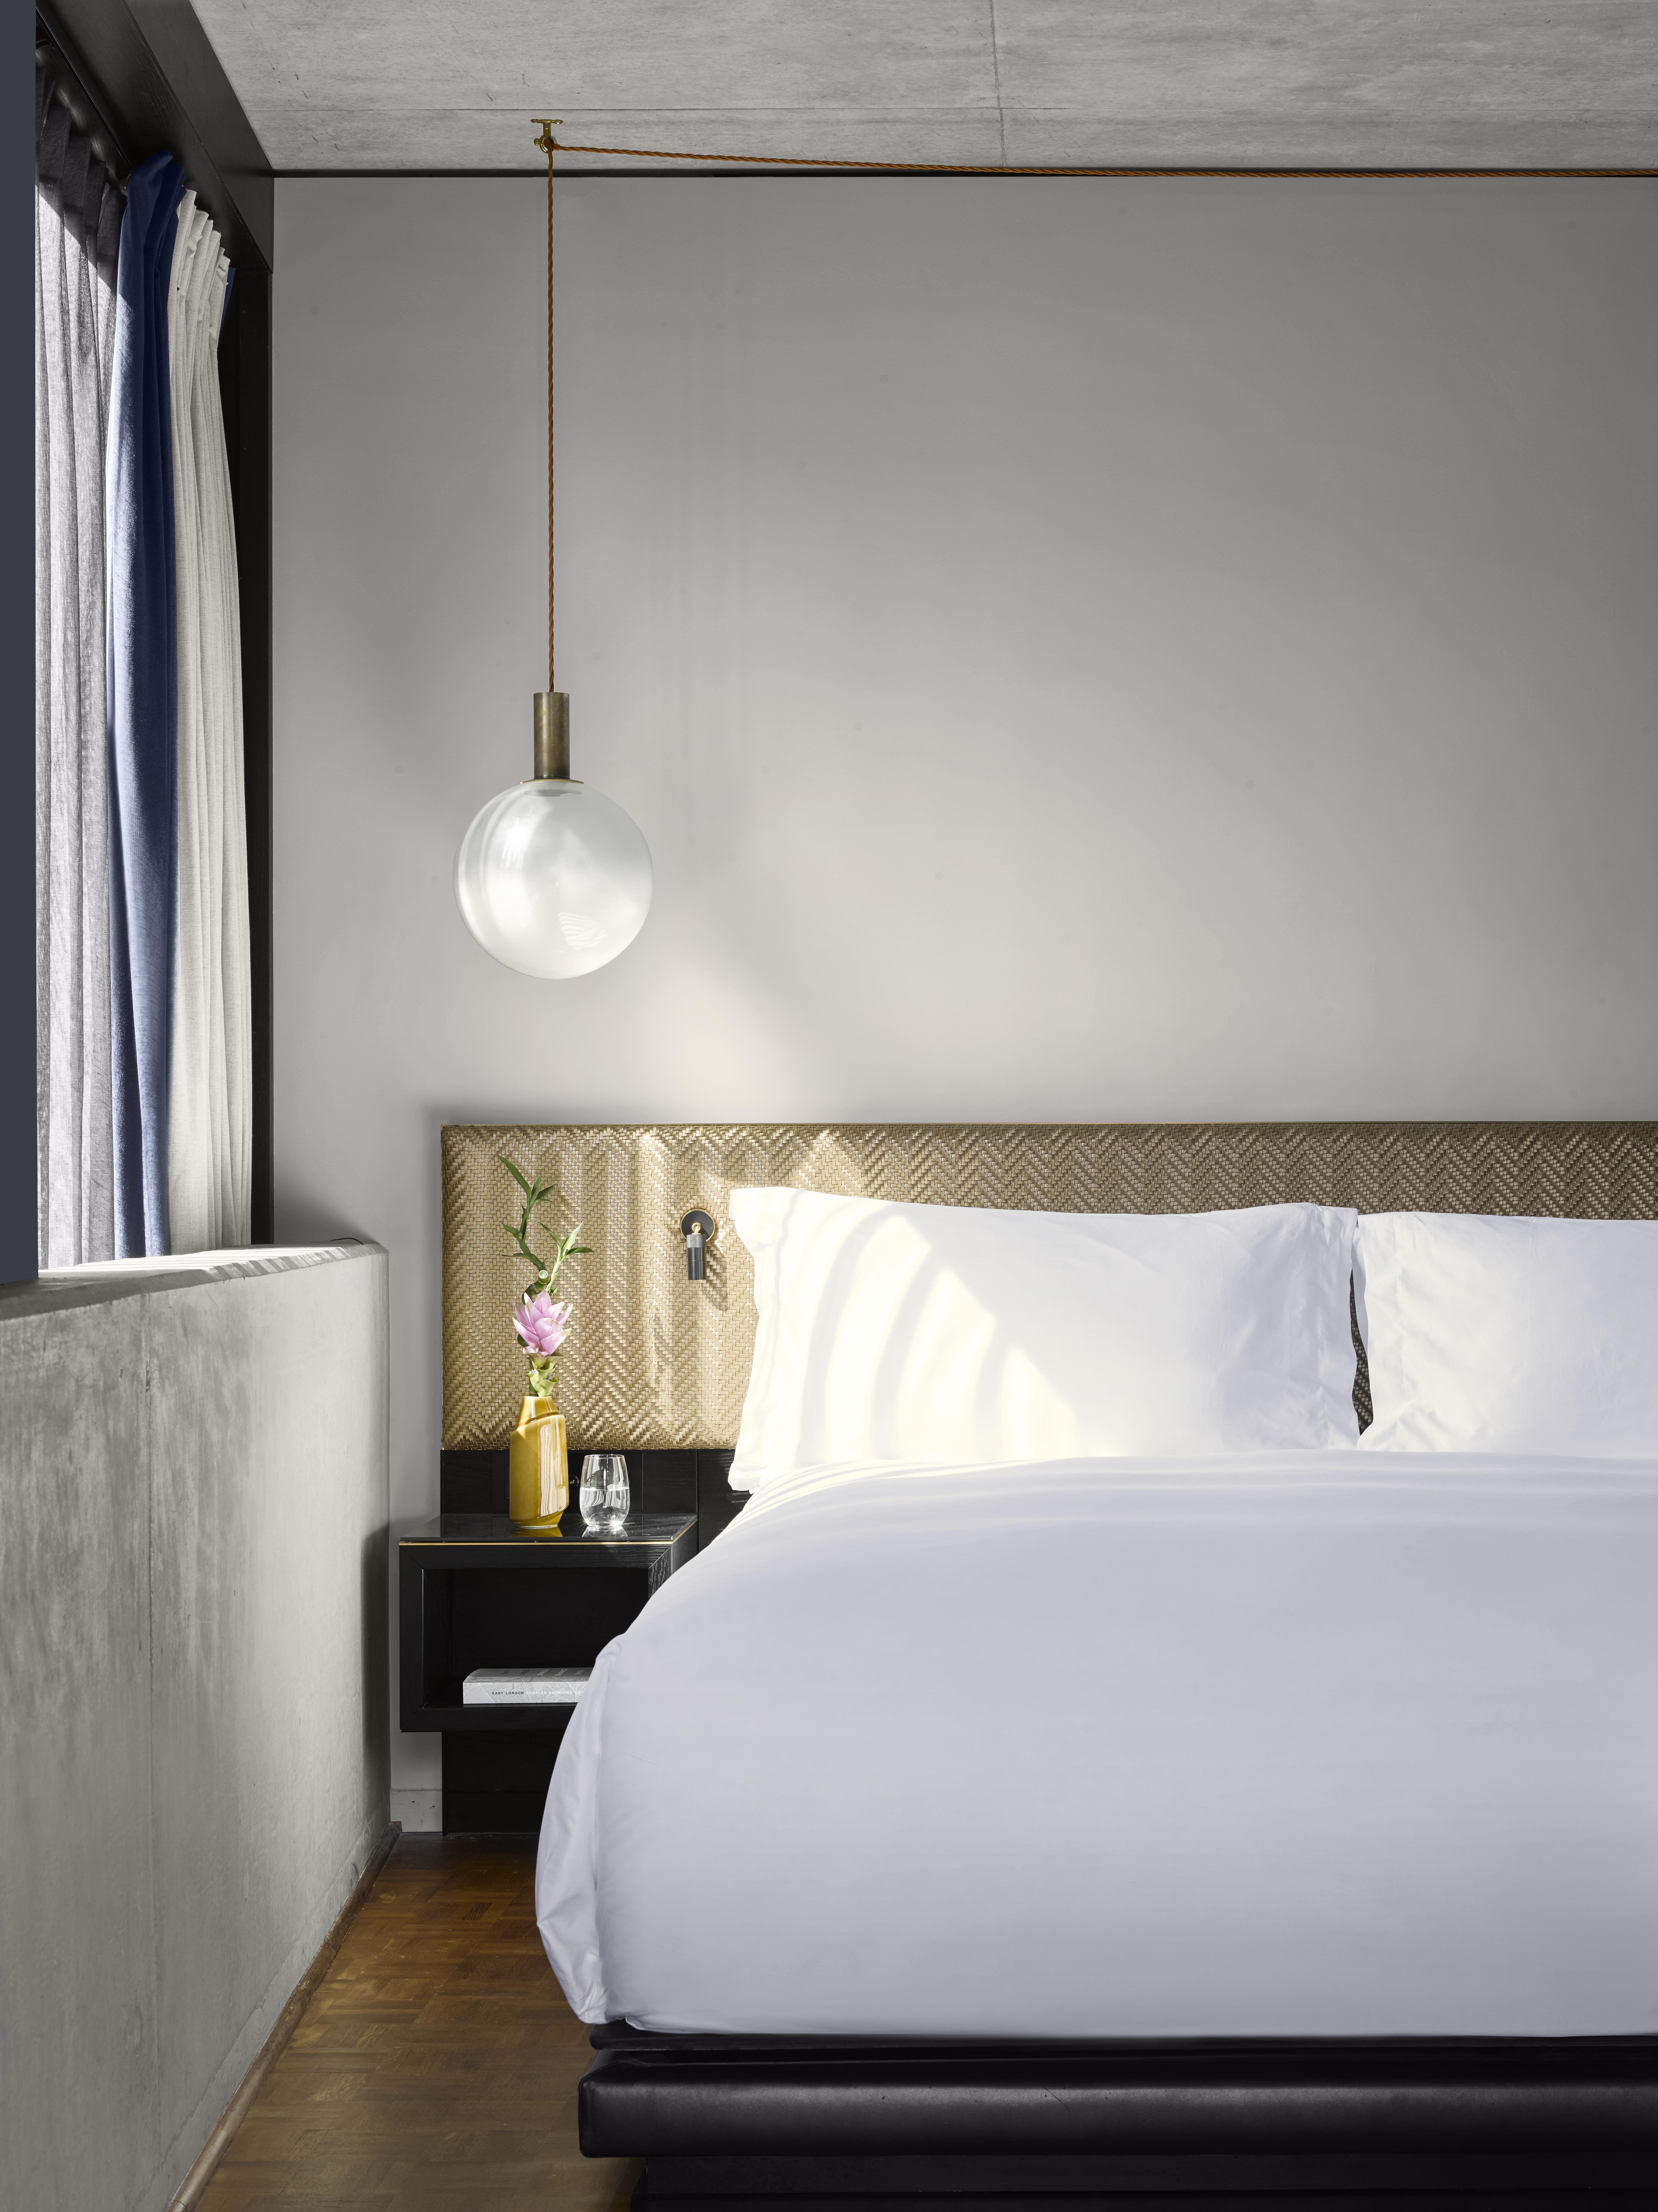 room details at nobu hotel shoreditch